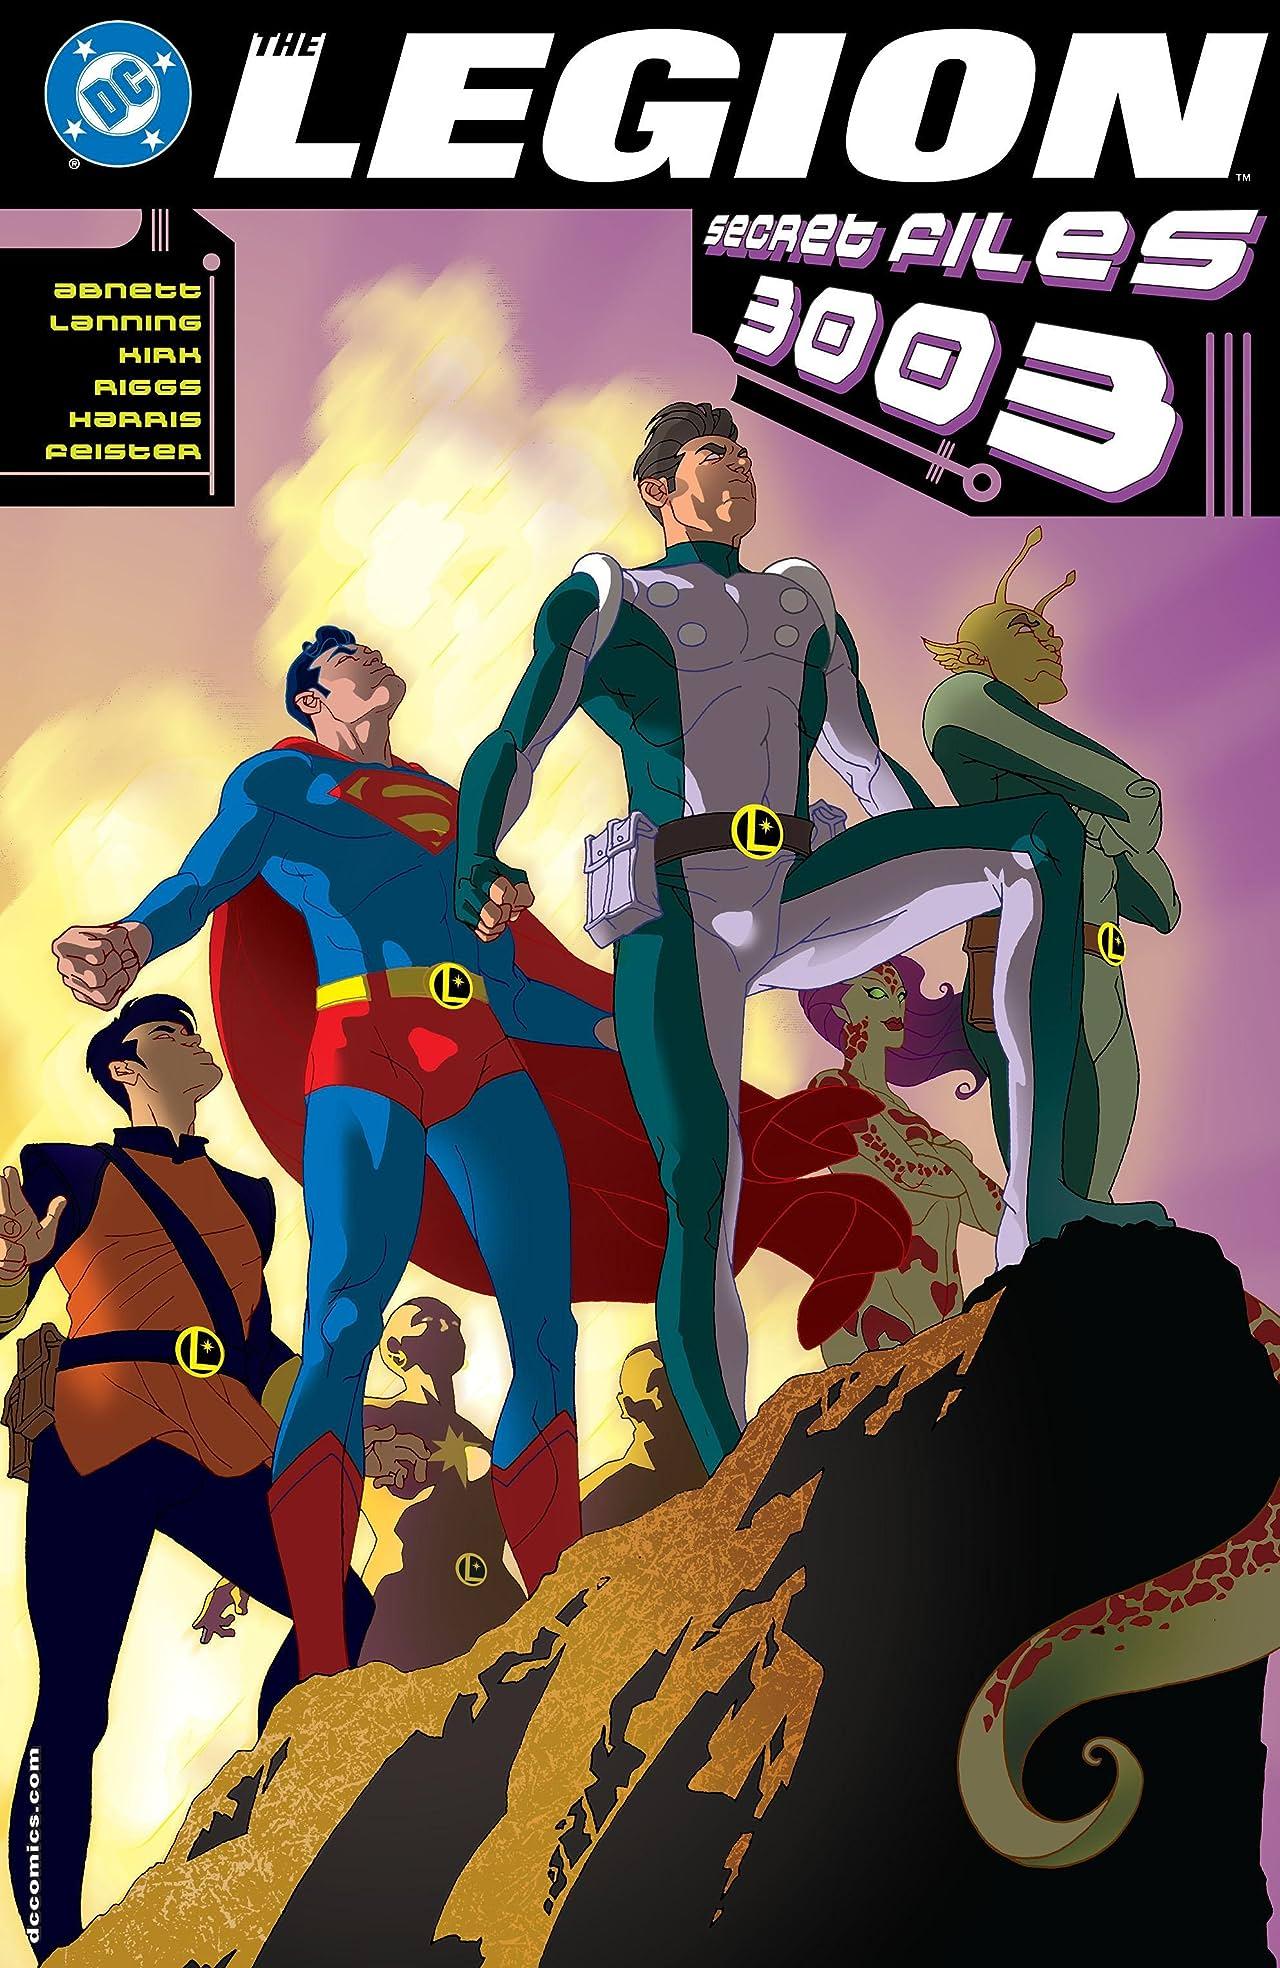 The Legion Secret Files 3003 (2003) #1